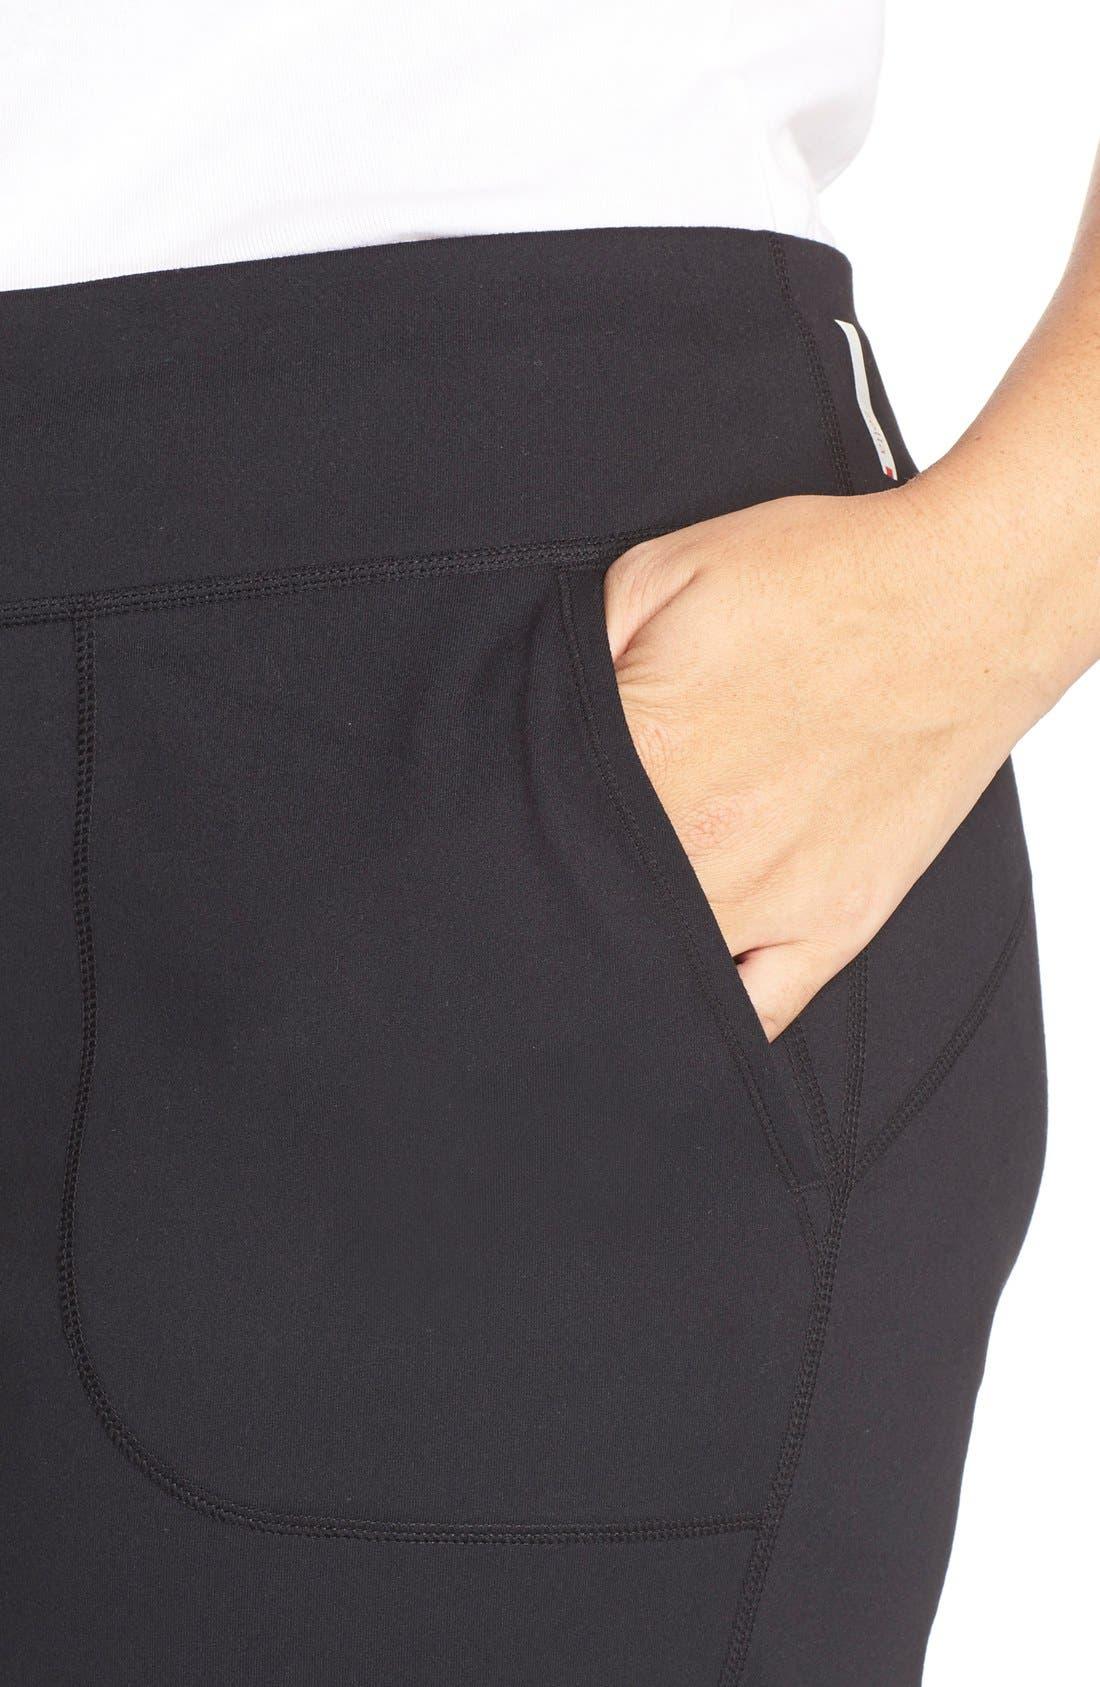 Alternate Image 4  - Zella 'Soul 3' Pants (Plus Size)